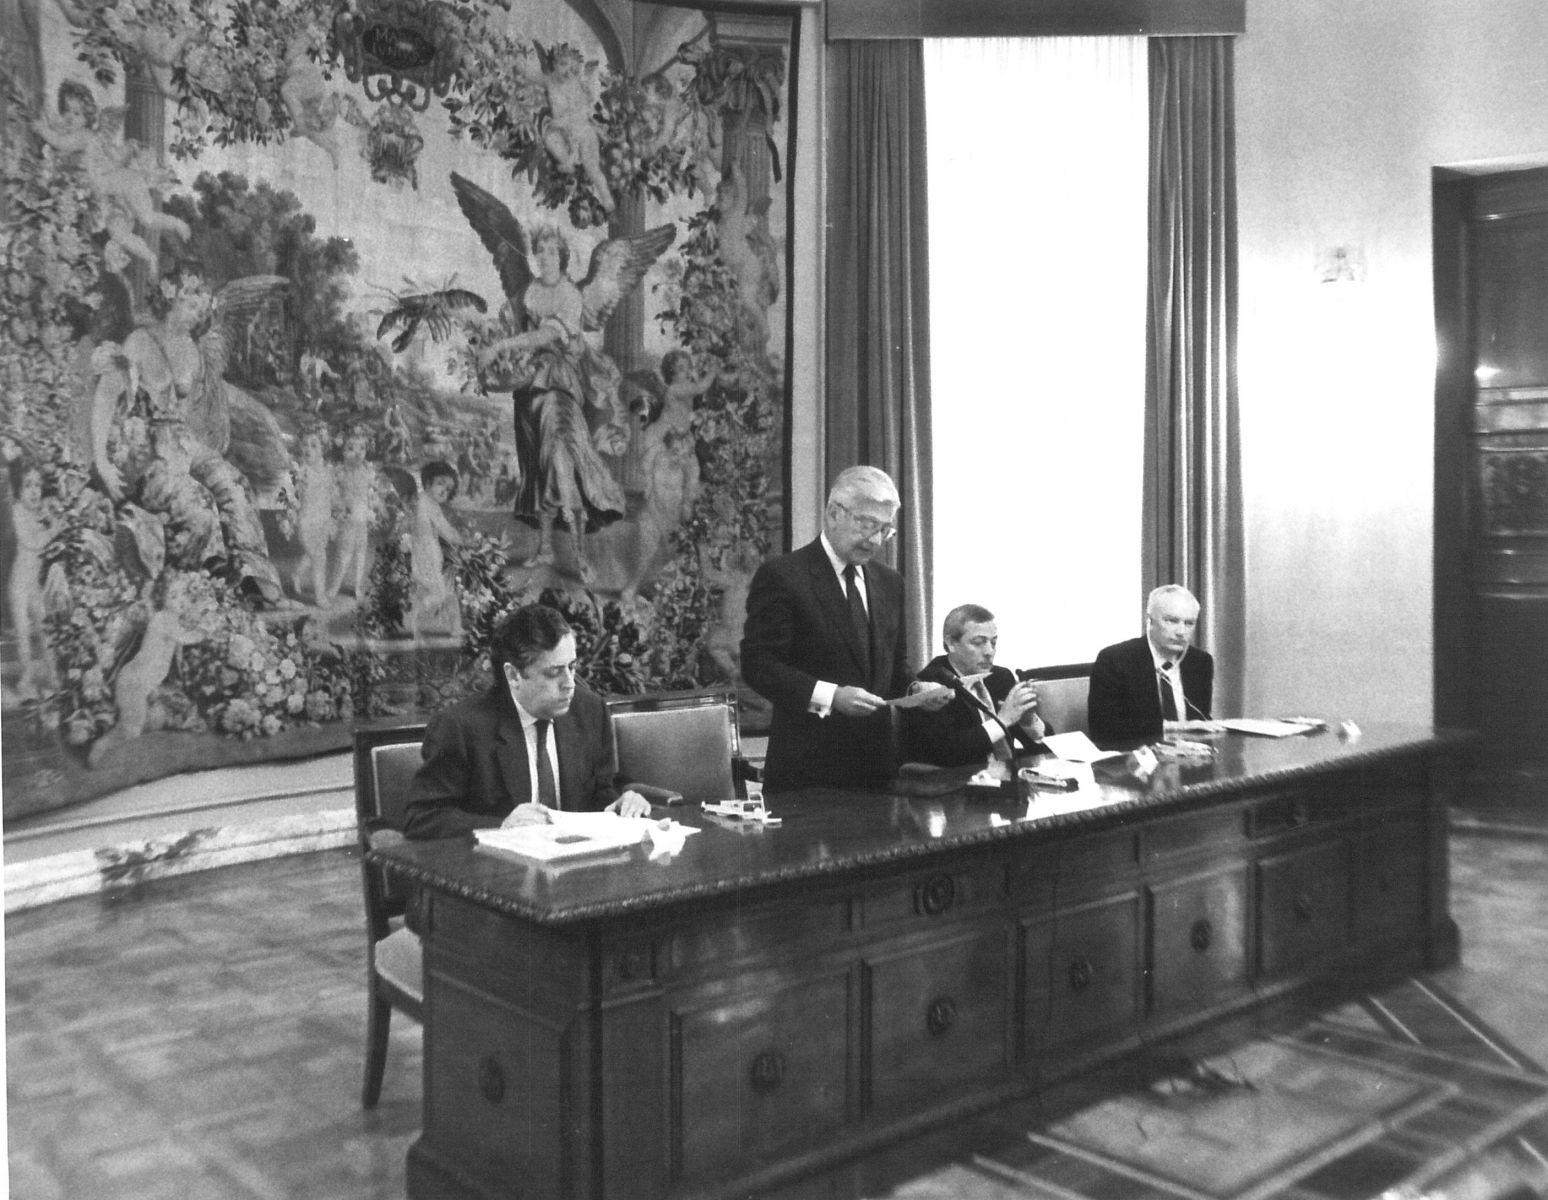 II Carlos de Amberes Commemorative Lecture